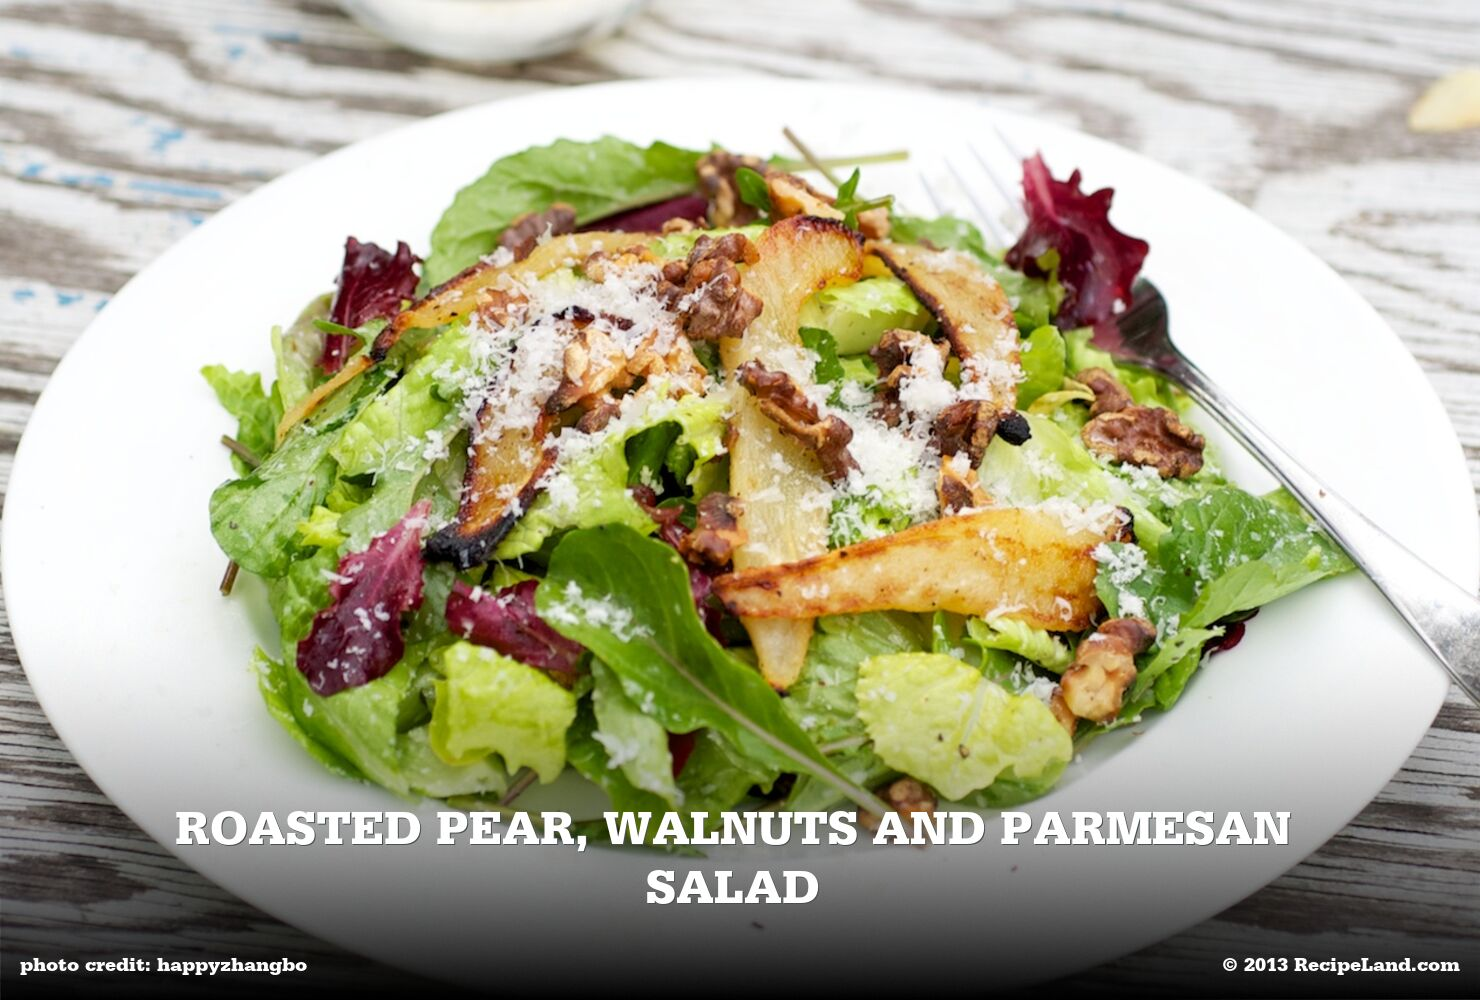 Roasted Pear, Walnuts and Parmesan Salad